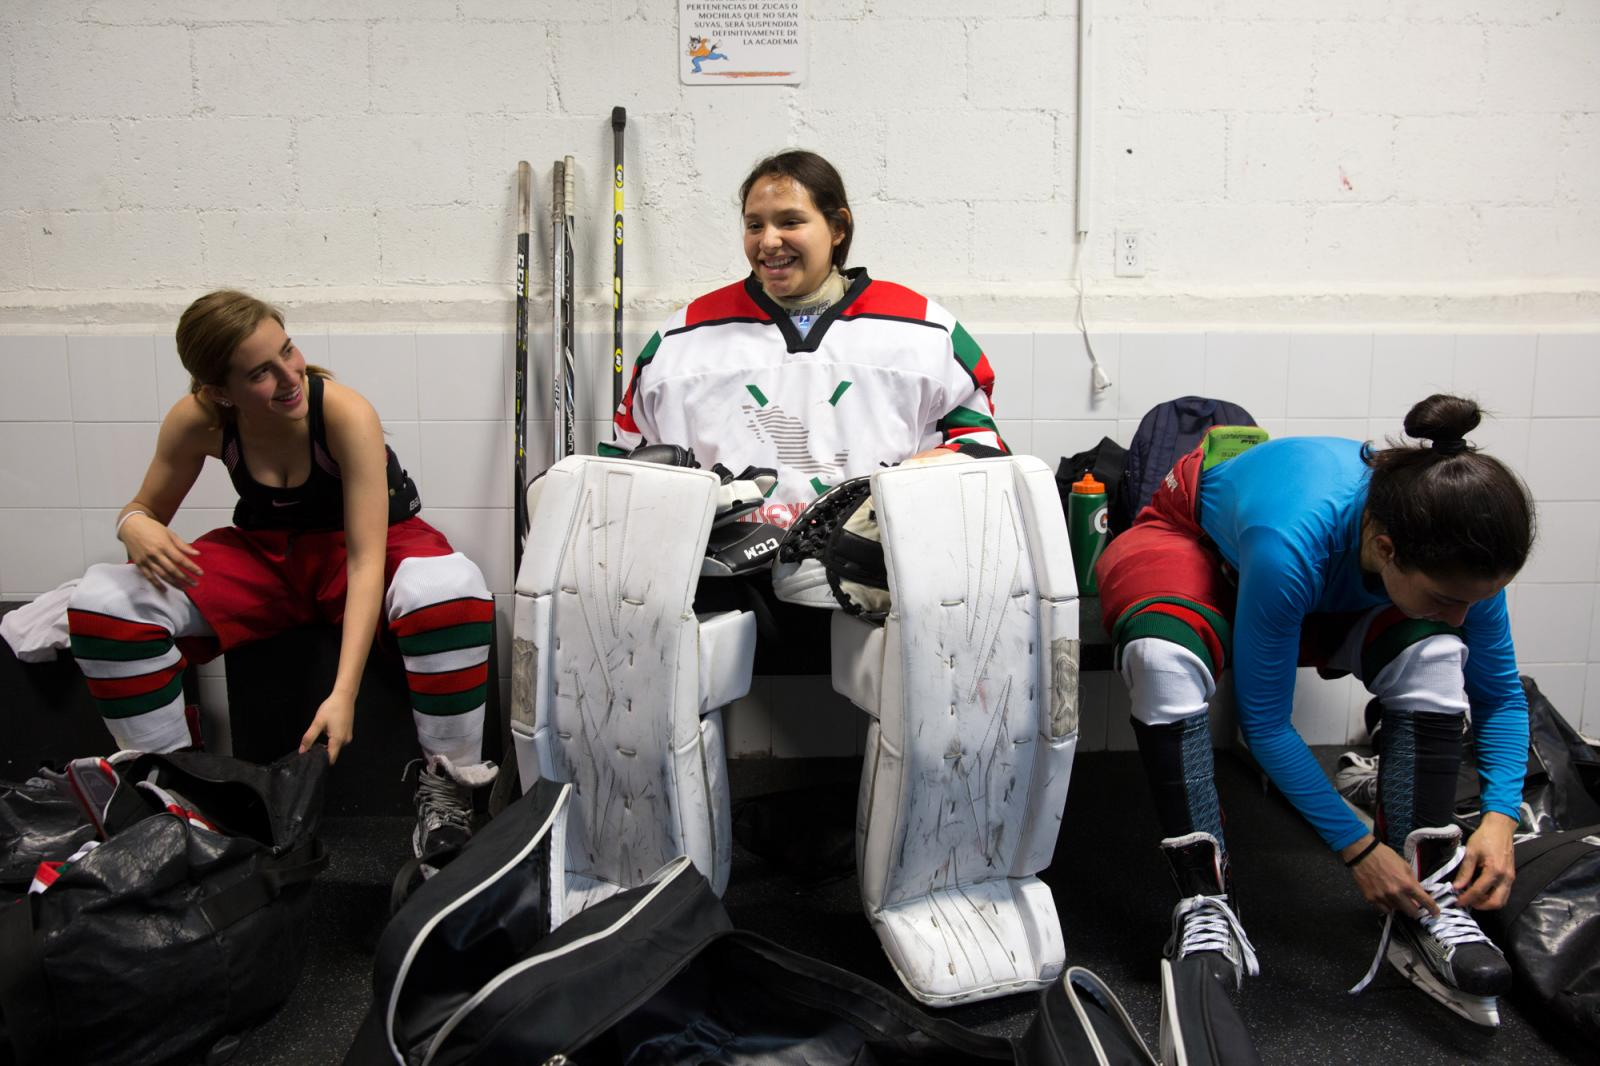 Photography image - Loading WomenIceHockey05.jpg